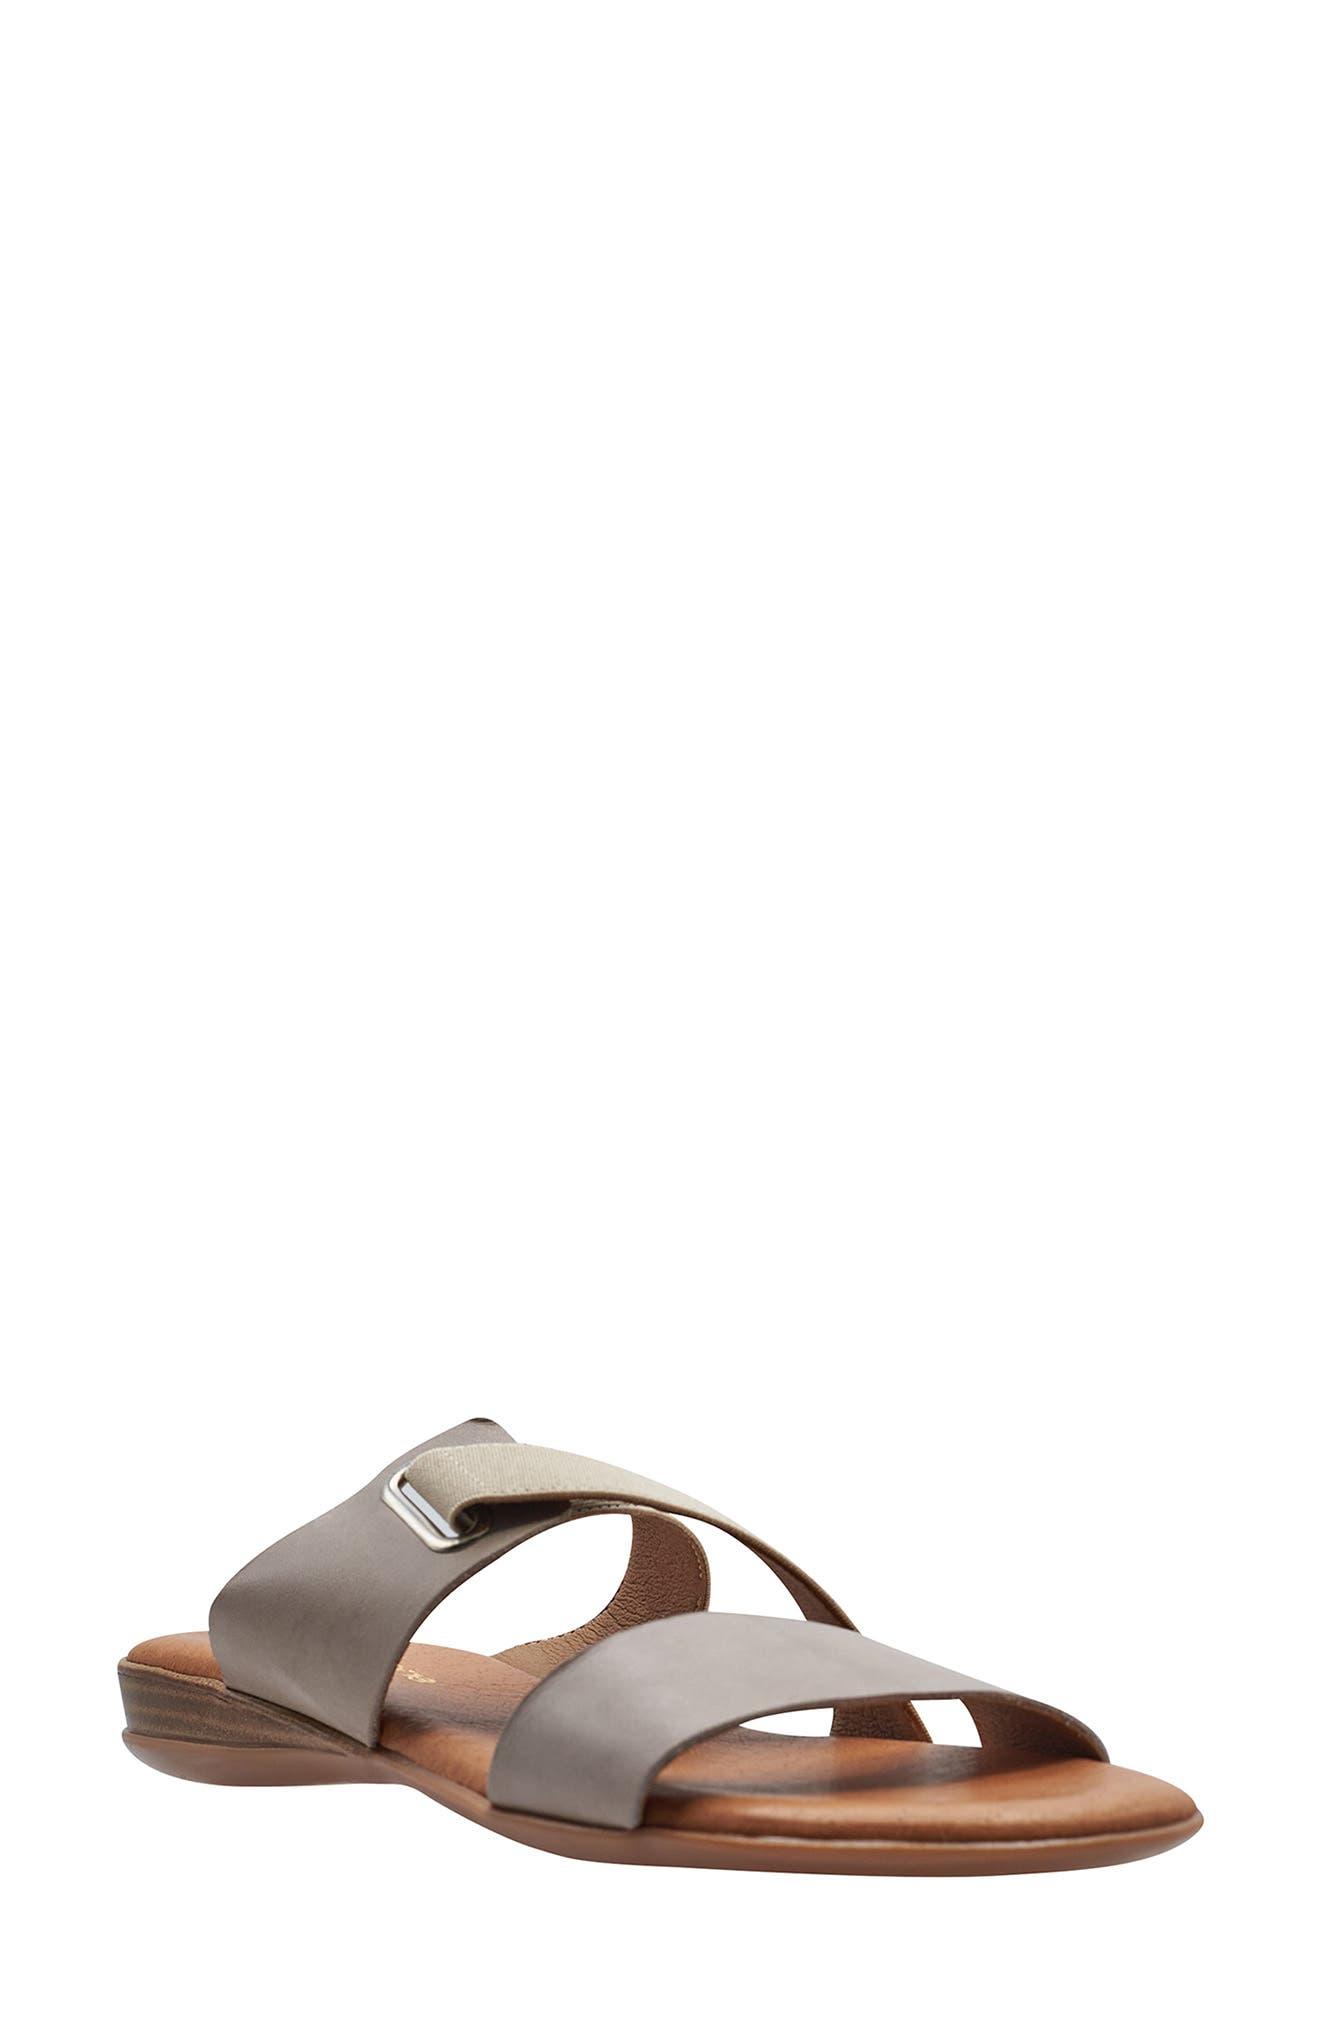 Alima Slide Sandal